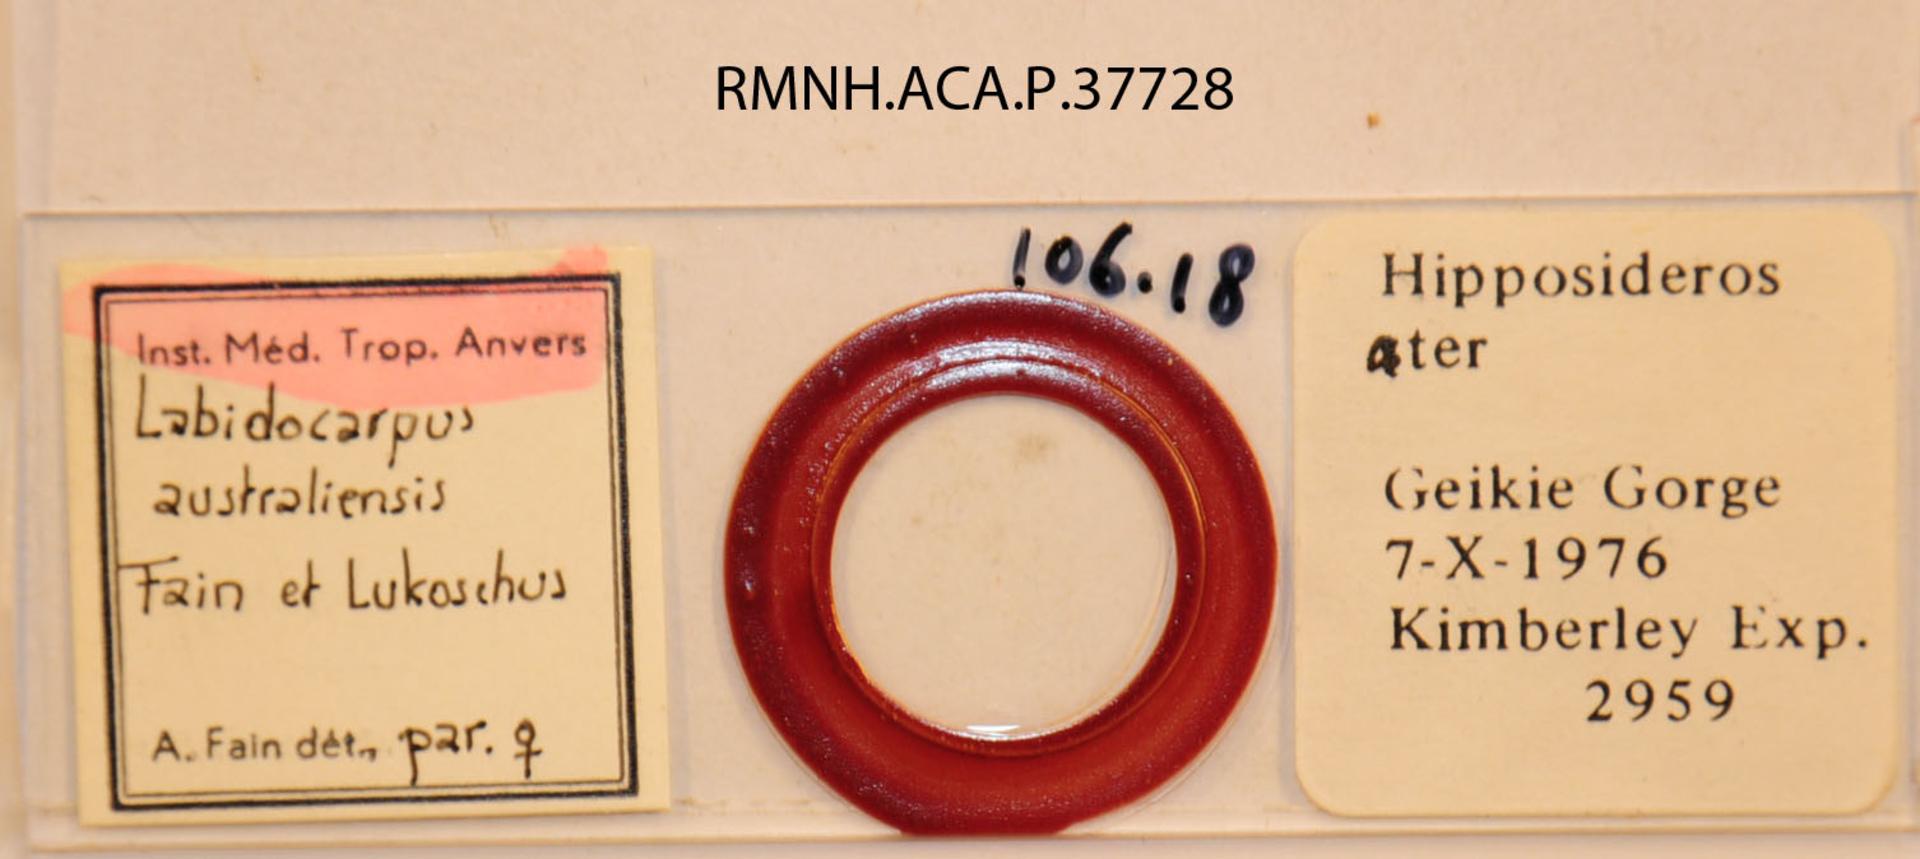 RMNH.ACA.P.37728   Labidocarpus australiensis Fain & Lukoschus